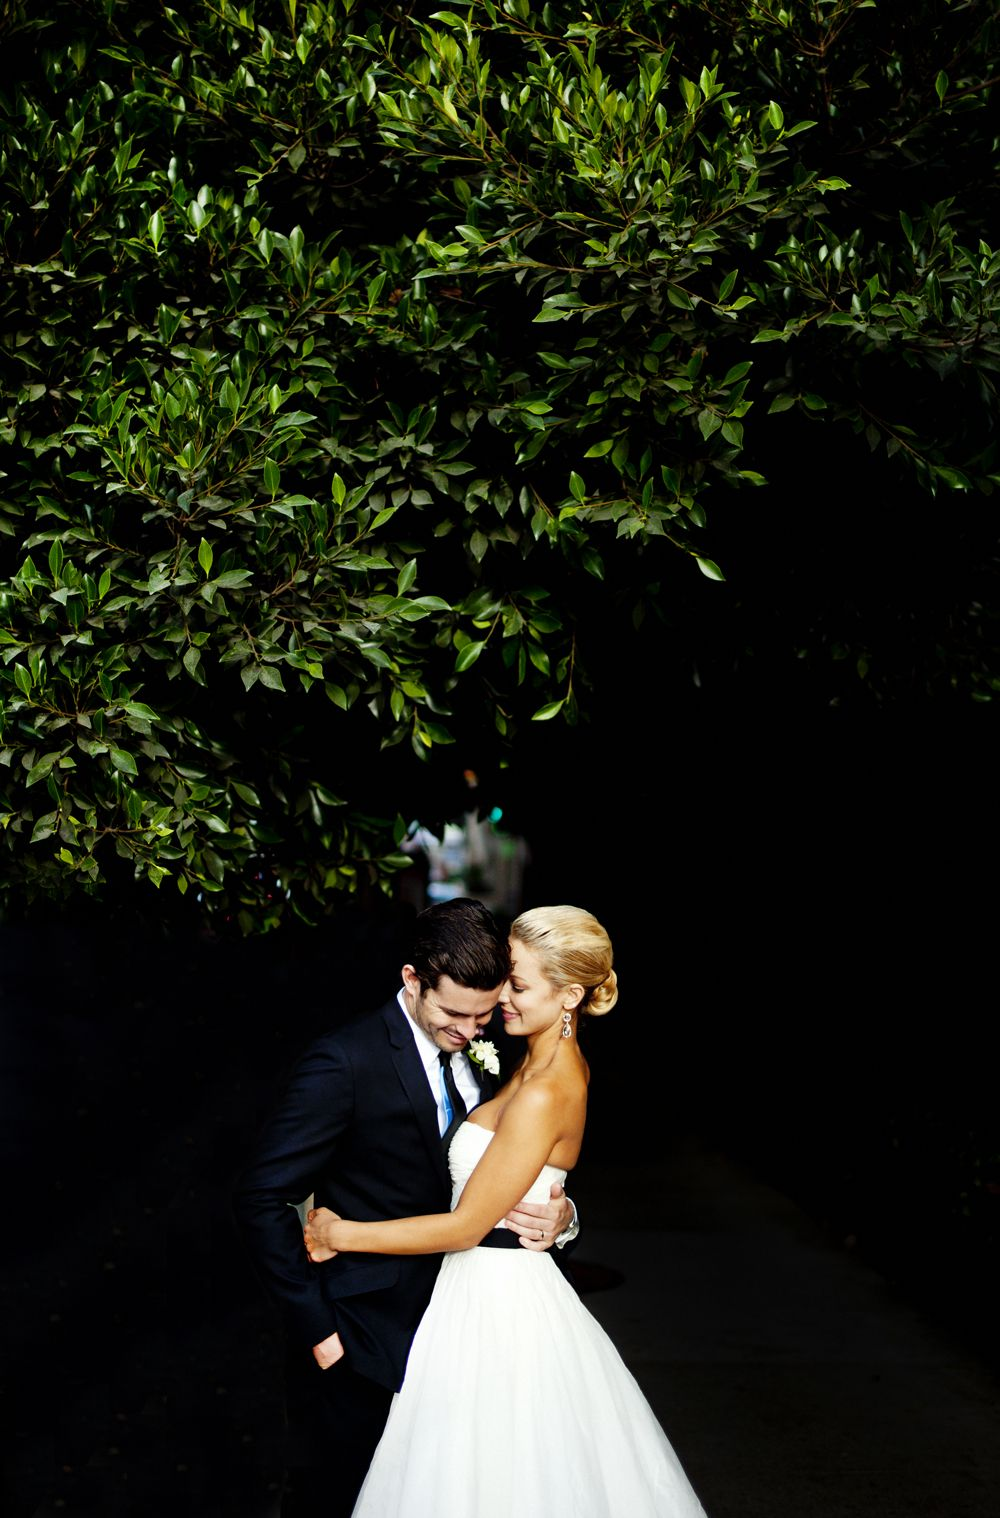 #wedding #decoration #planning #ideas #groom #groomsmen #bride #bridesmaids #setting #food #drinks #decor #events